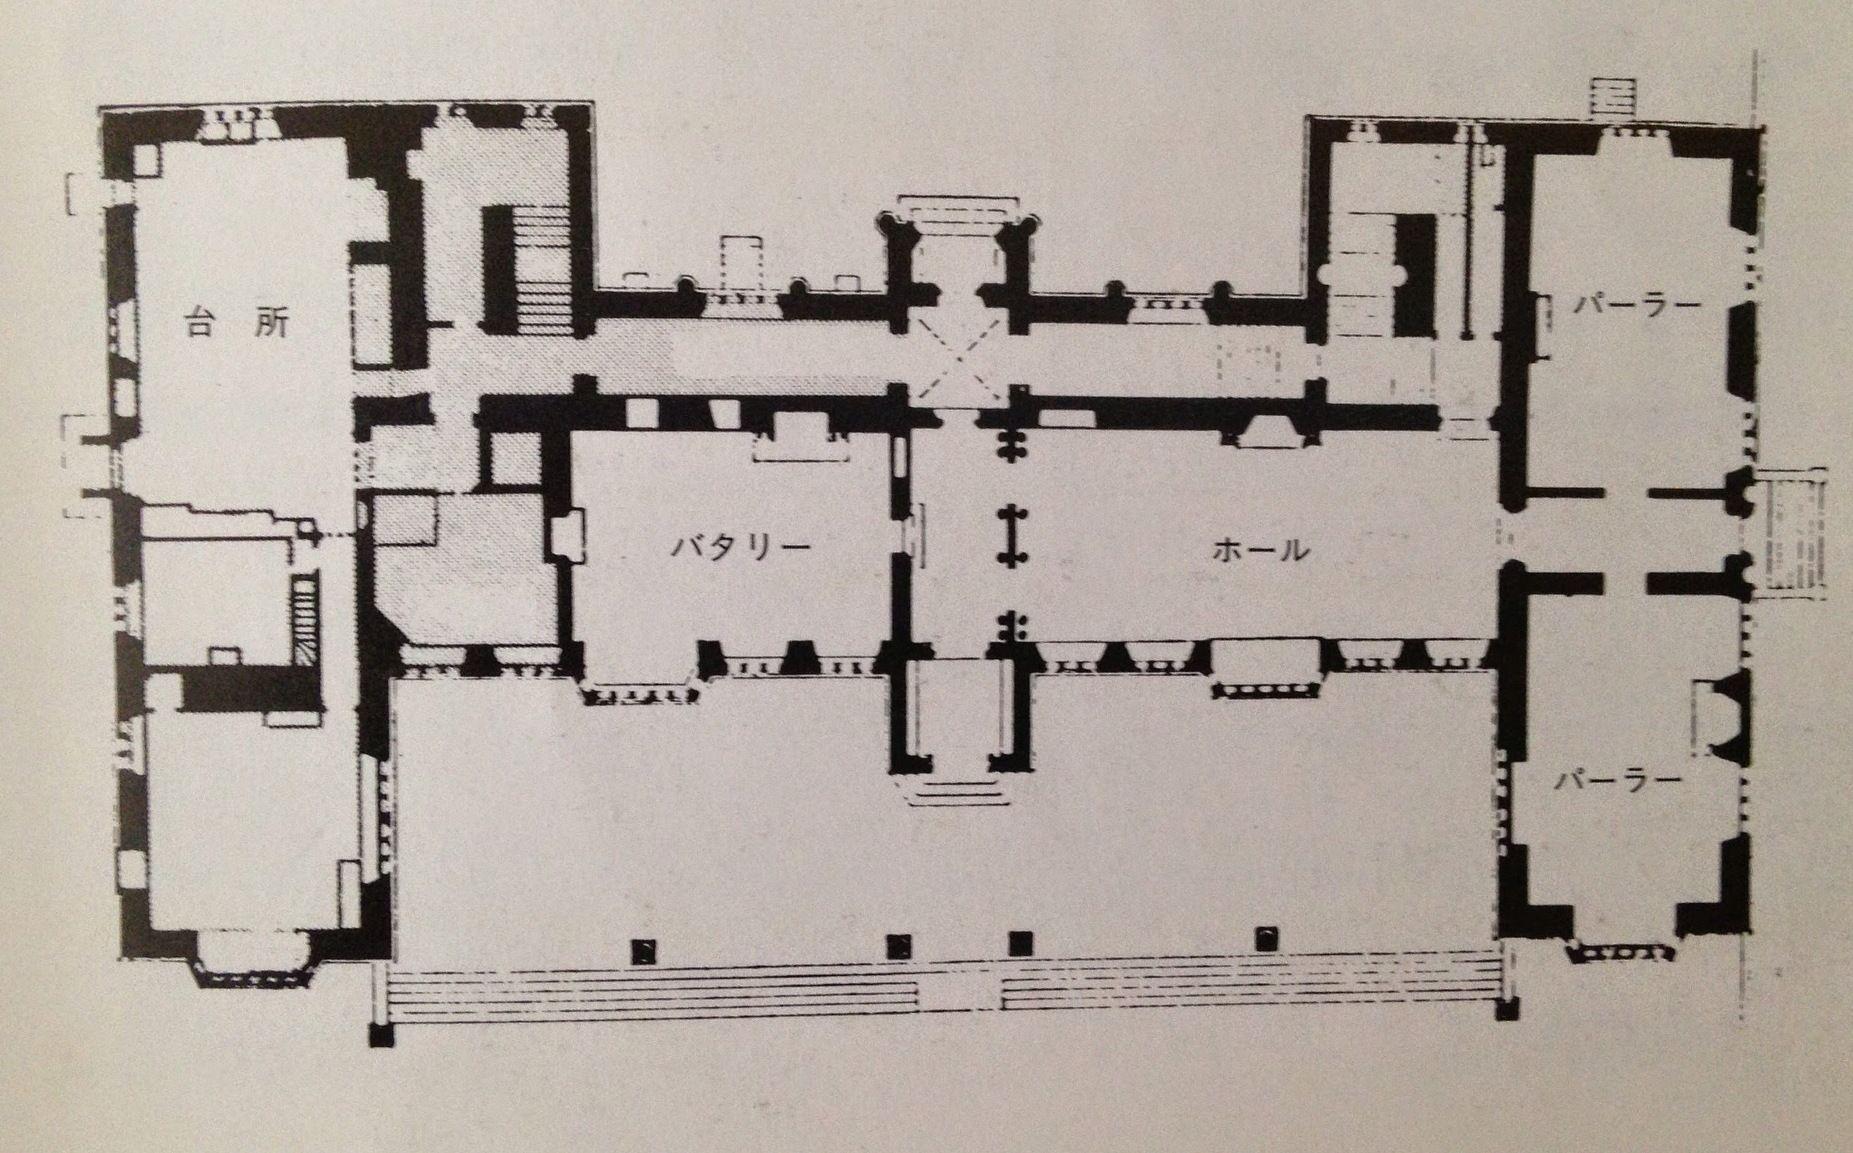 Pin By Mark Raby On Floorplan Floor Plans Ground Floor Plan Architecture Plan